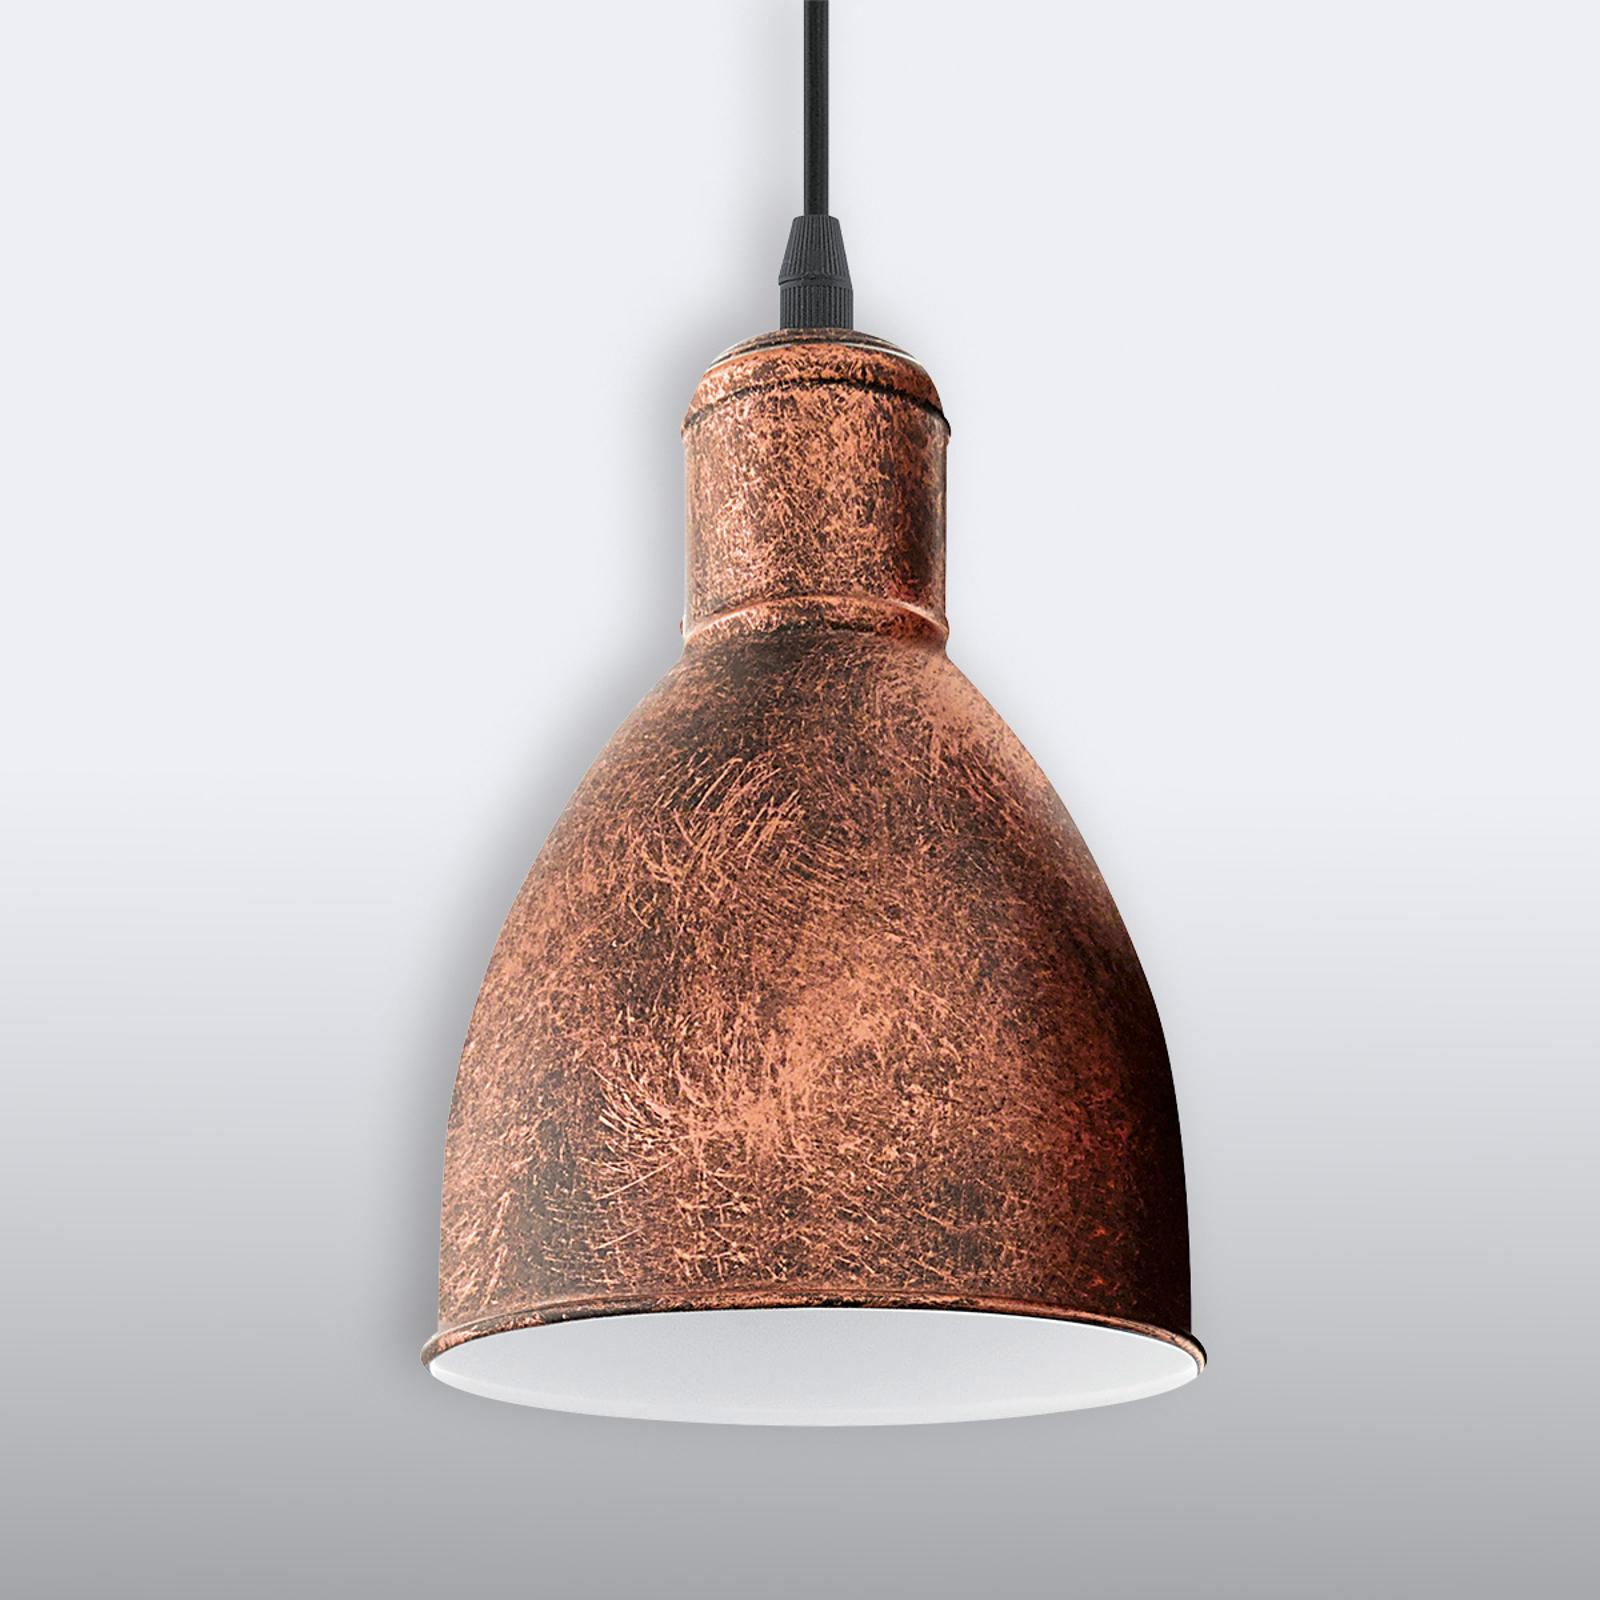 Pendant light Priddy 1, one-bulb, antique copper_3031783_1